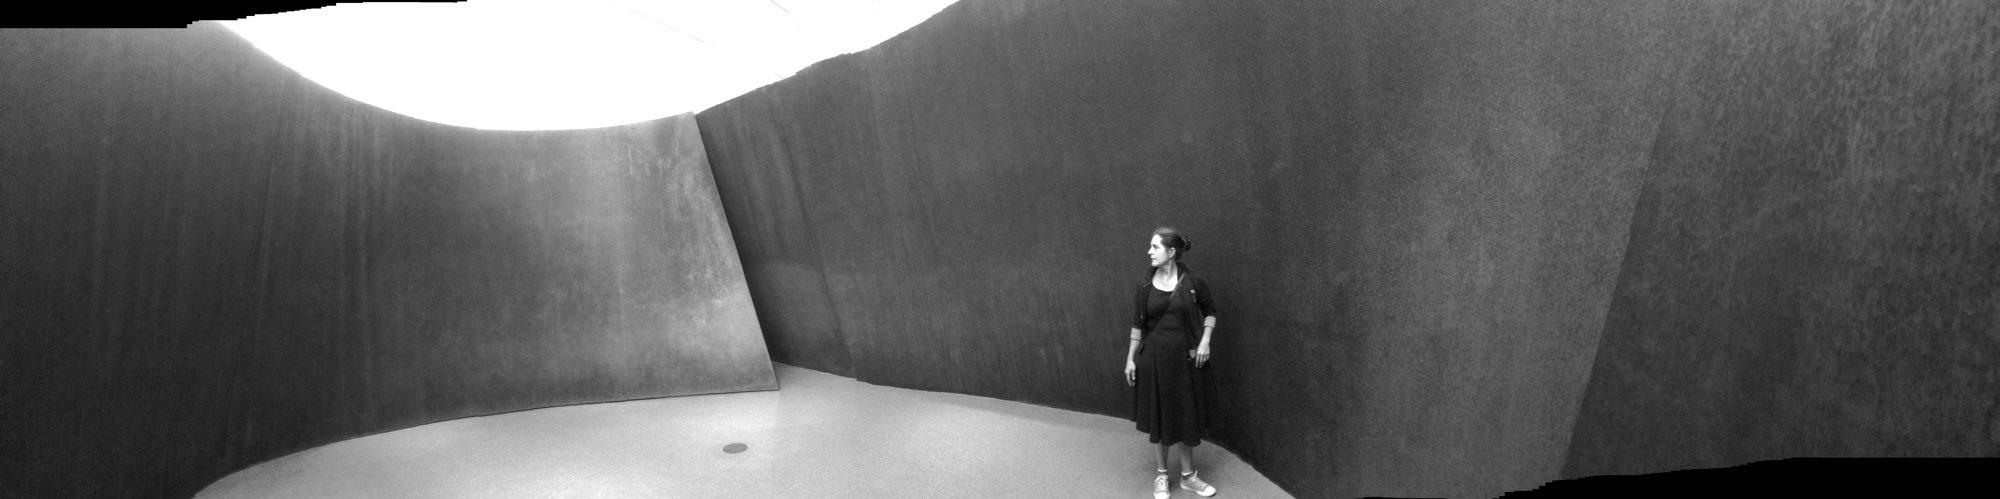 Panorama, Abi standing in Richard Serra's Sequence